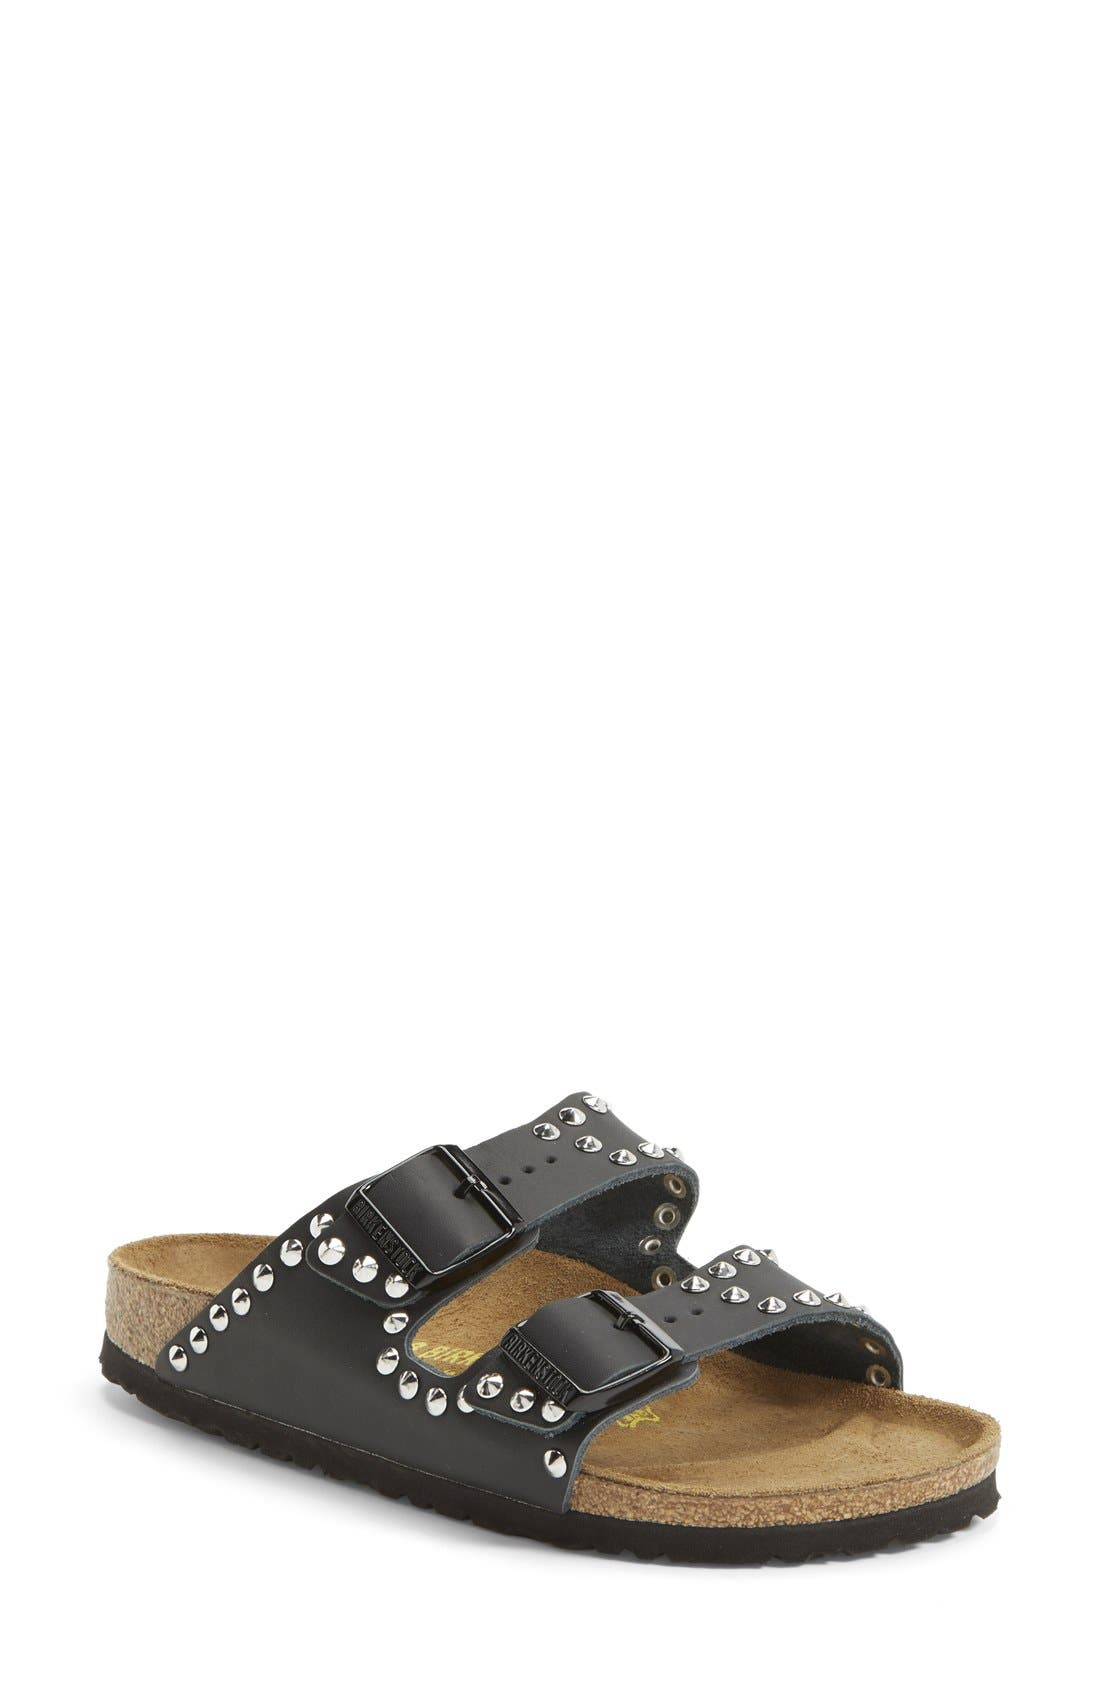 BIRKENSTOCK, 'Arizona' Studded Leather Sandal, Main thumbnail 1, color, 001